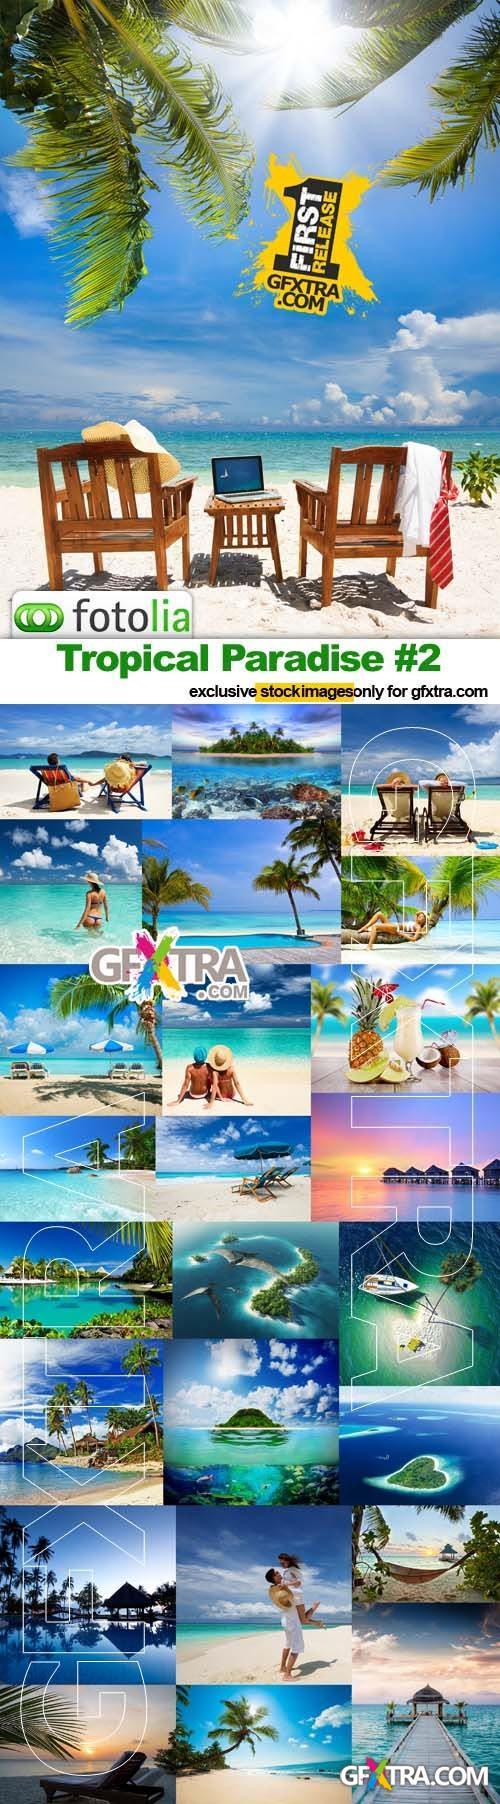 Tropical Paradise #2 - 25x JPEGs